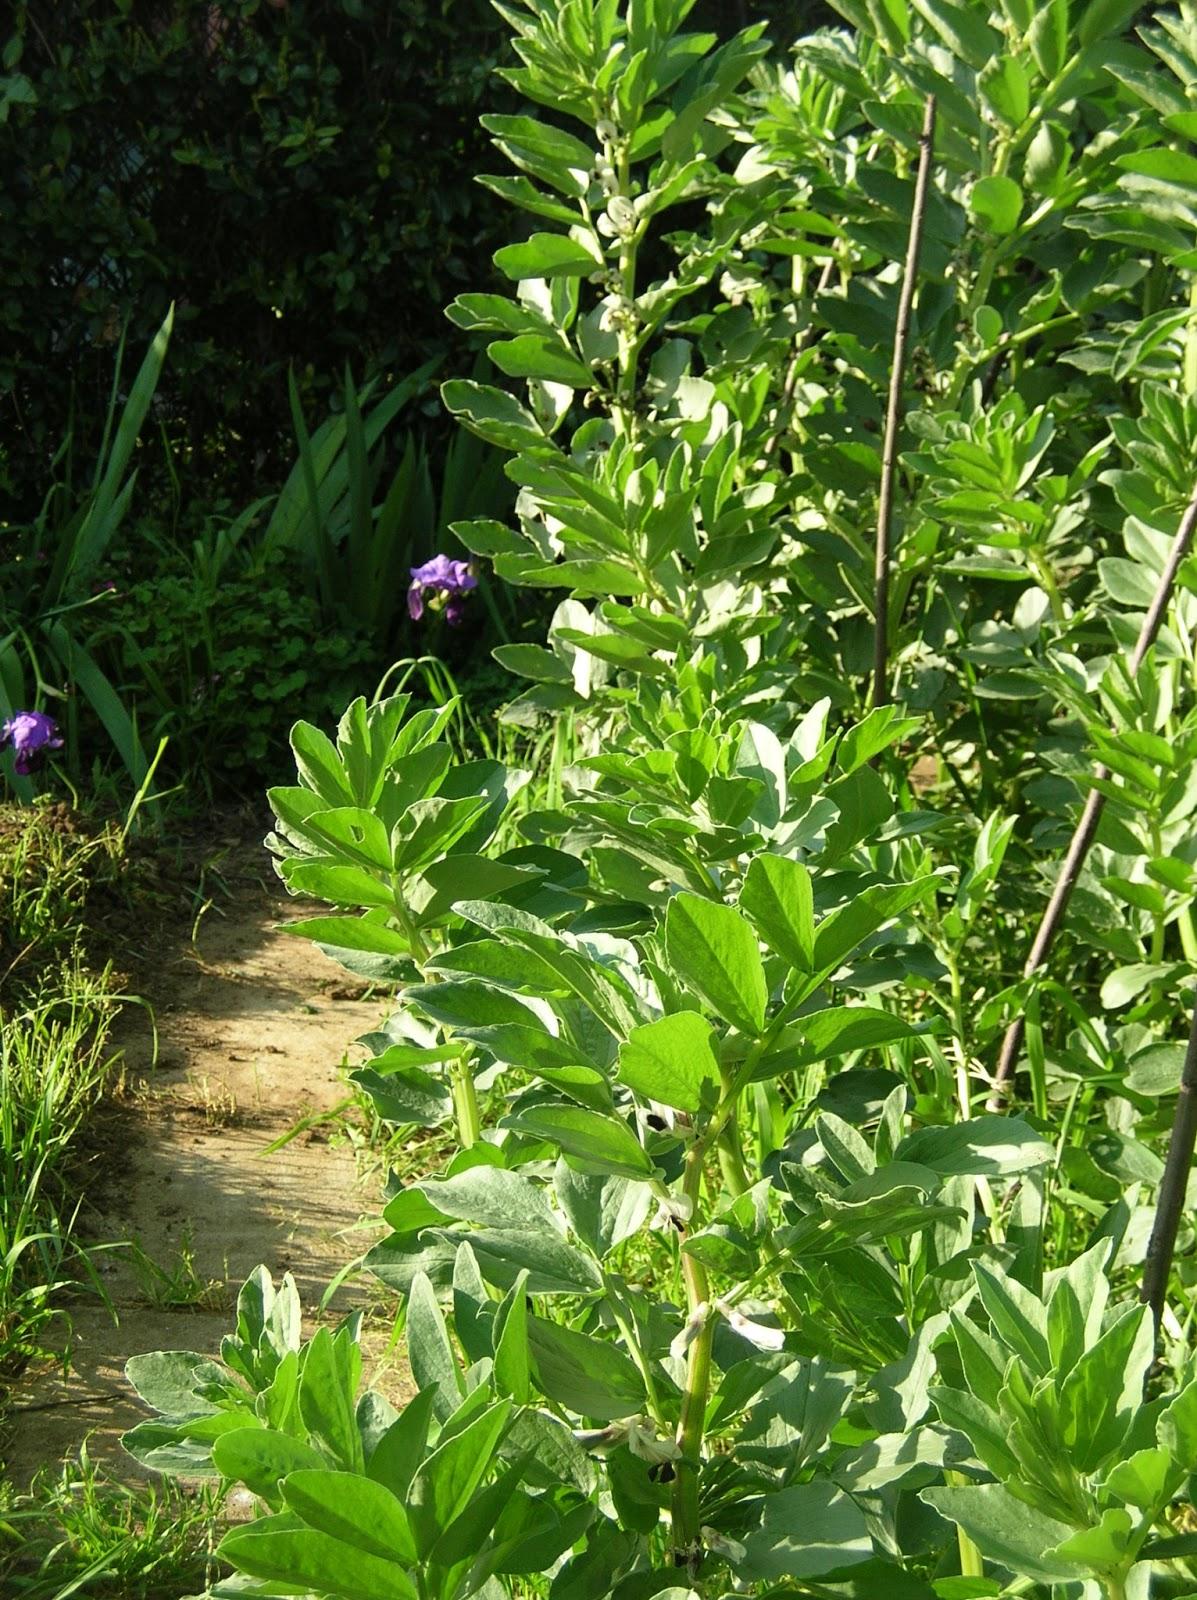 la primavera idee giardino fresco : La Primavera nel mio orto ? arrivata...e io la vedo! Linkiesta.it